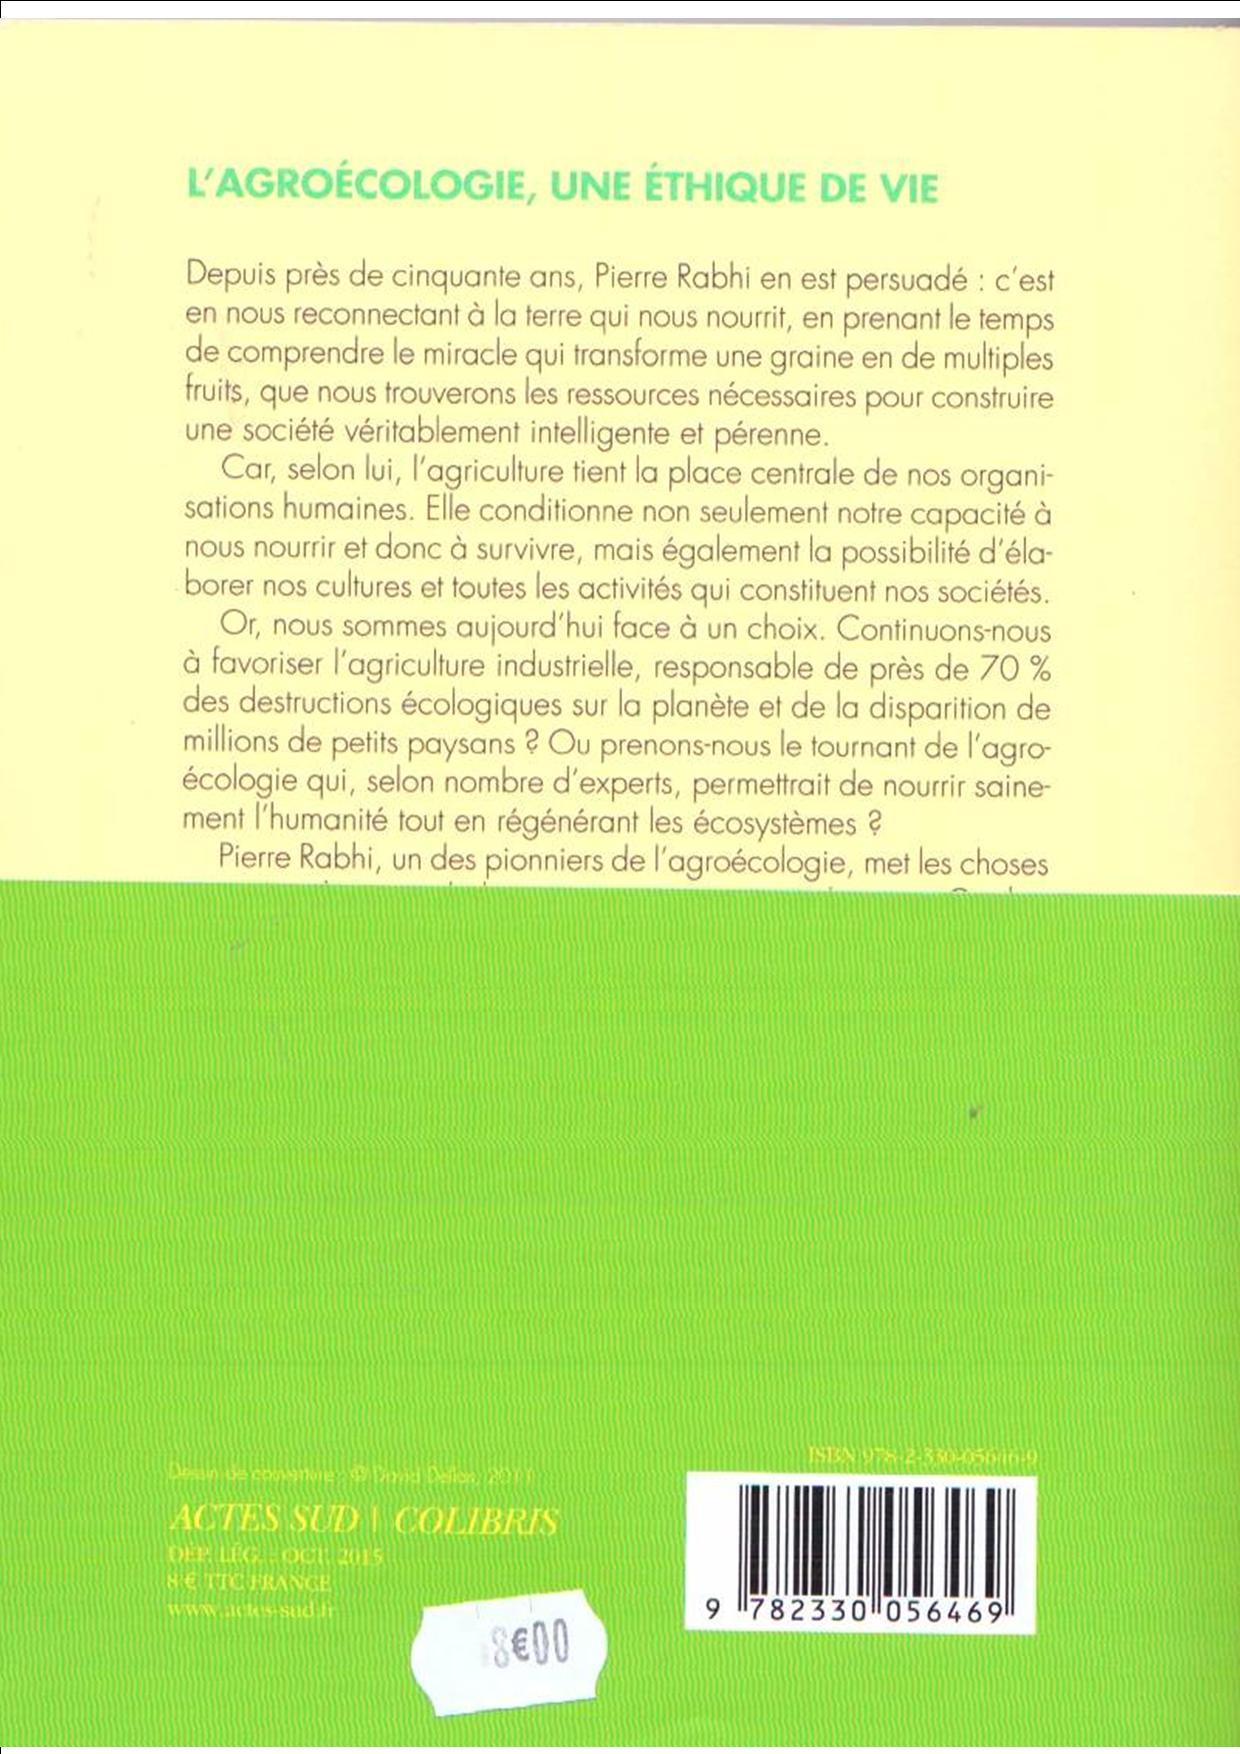 Rabhi agroecologie verso